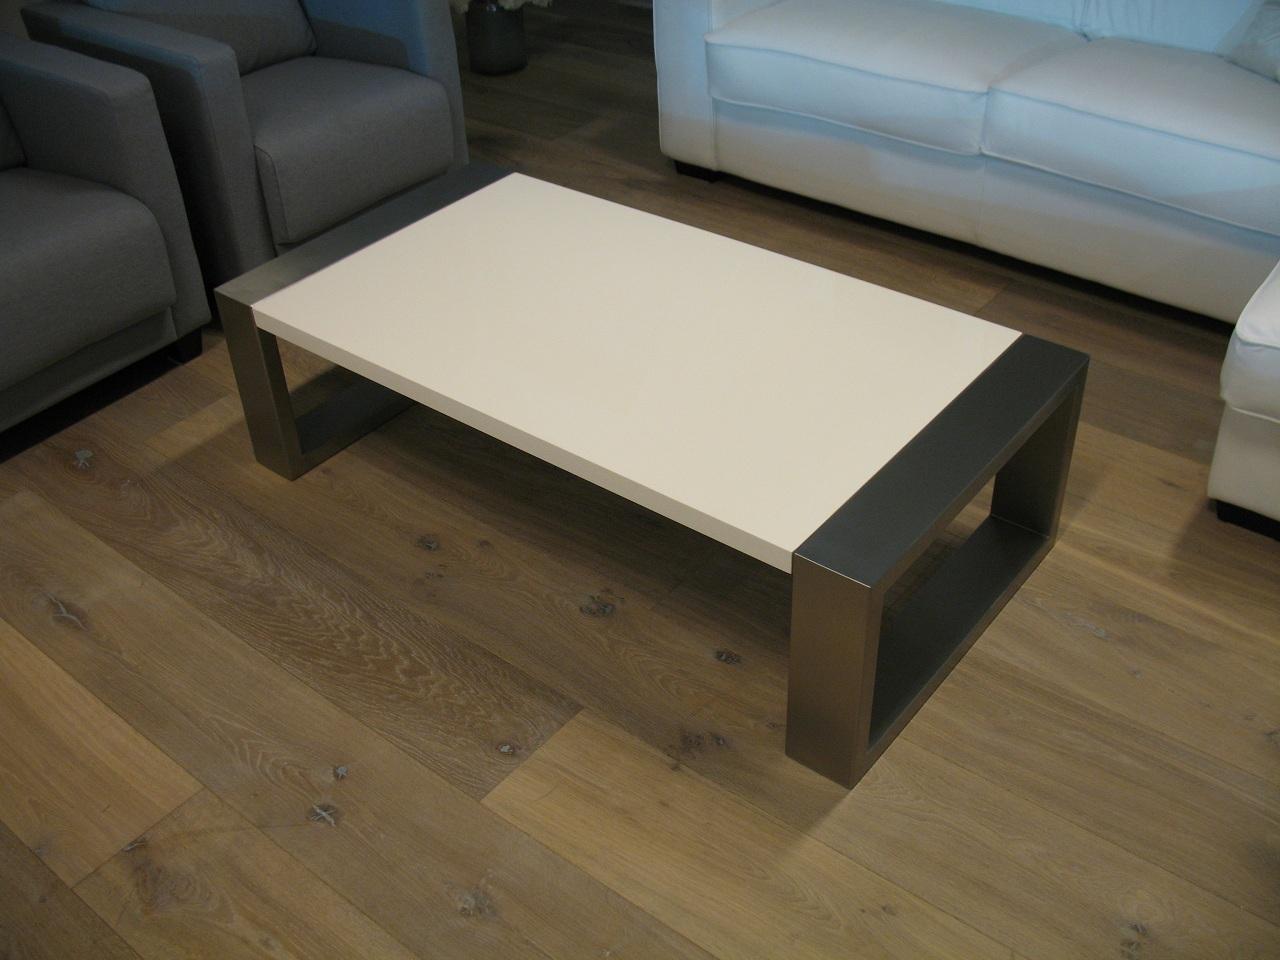 Salon Tafel Wit : Demaakfabriek roestvrijstalen salontafel in hoogglans wit